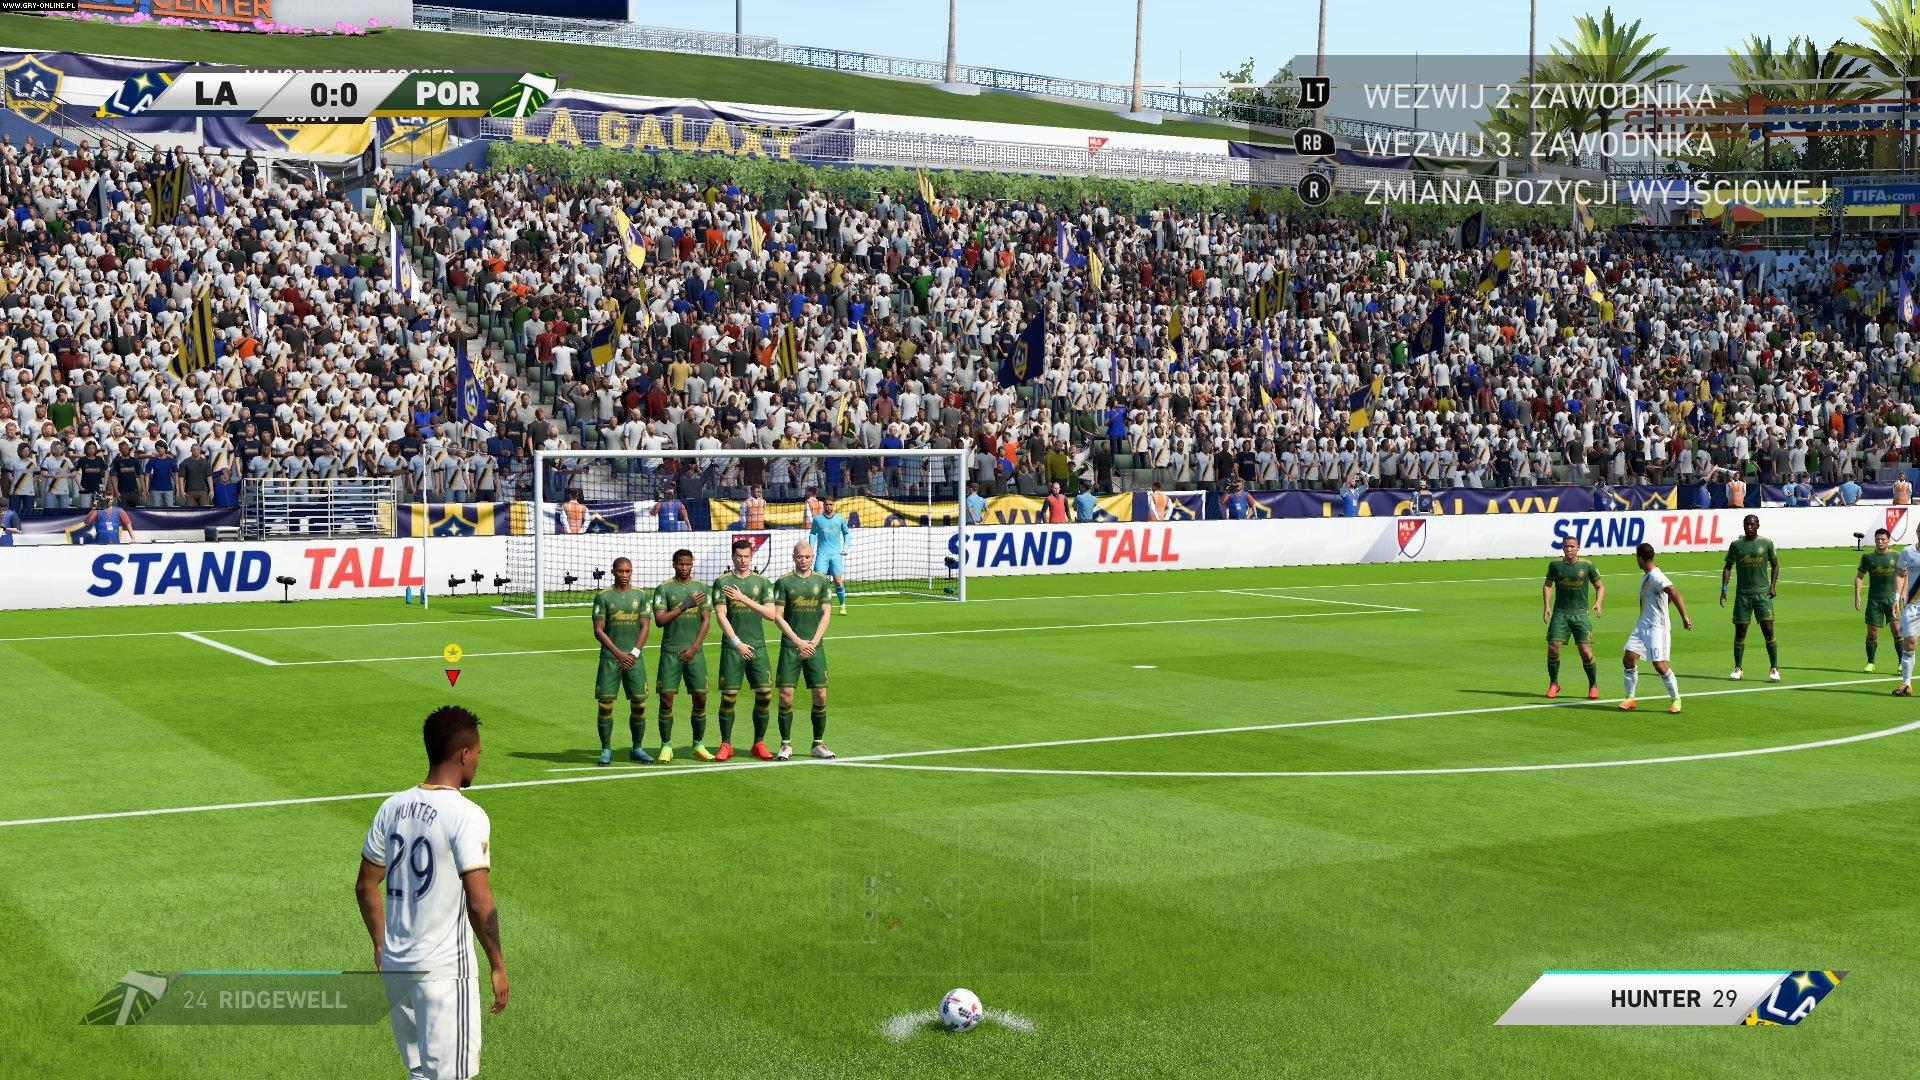 FIFA 18 PC PS4 XONE Games Image 33 49 EA Sports